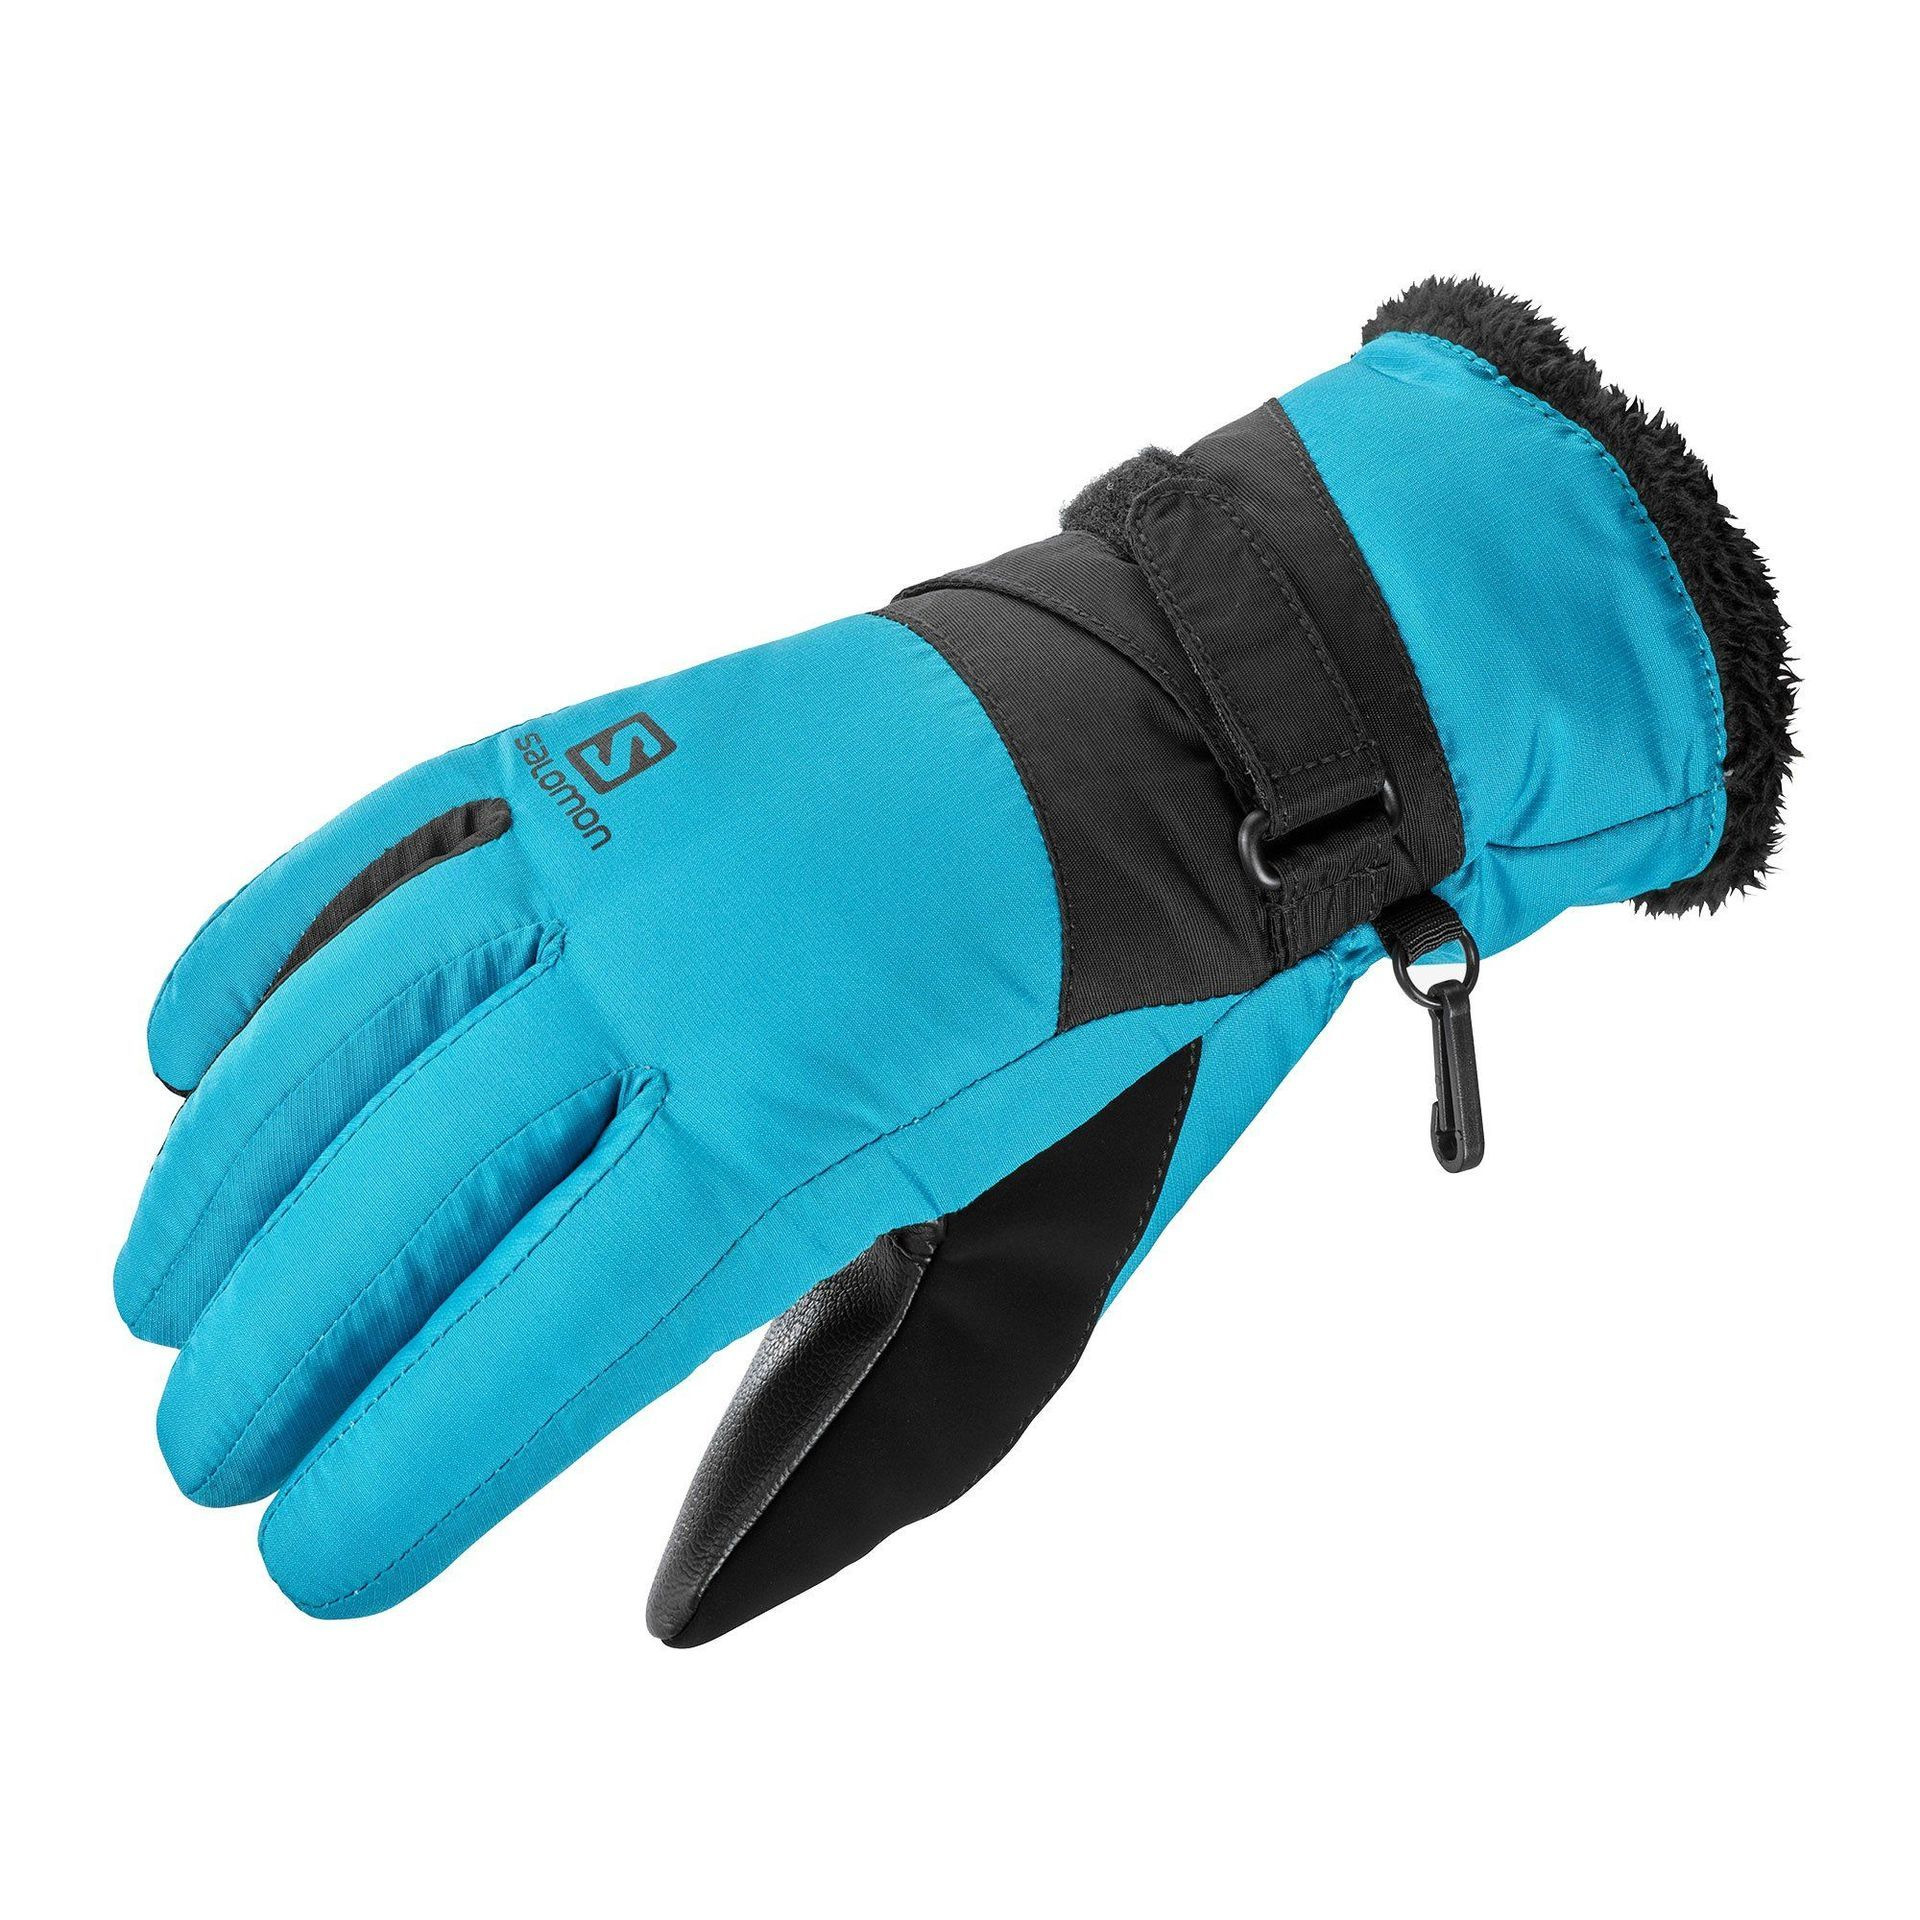 Rękawice Salomon Force Dry